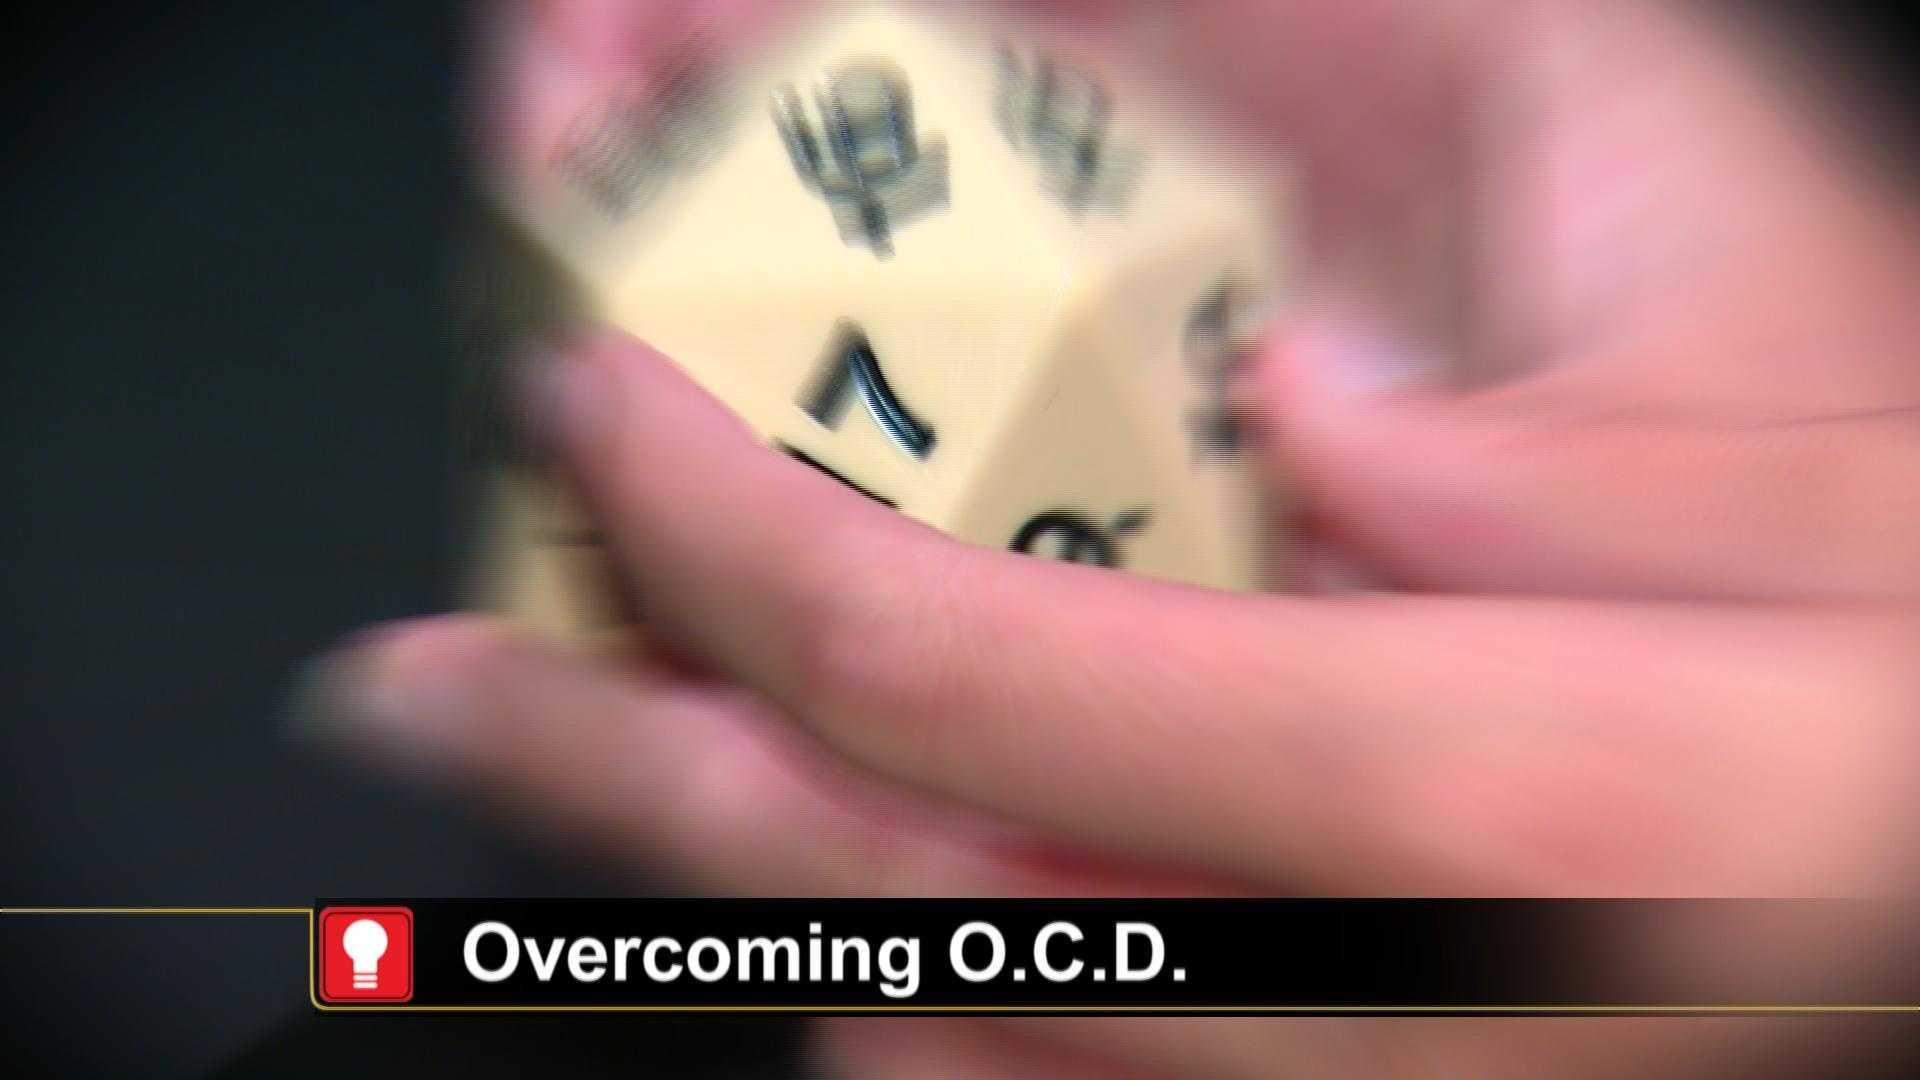 Image: Obsessive-Compulsive Disorder